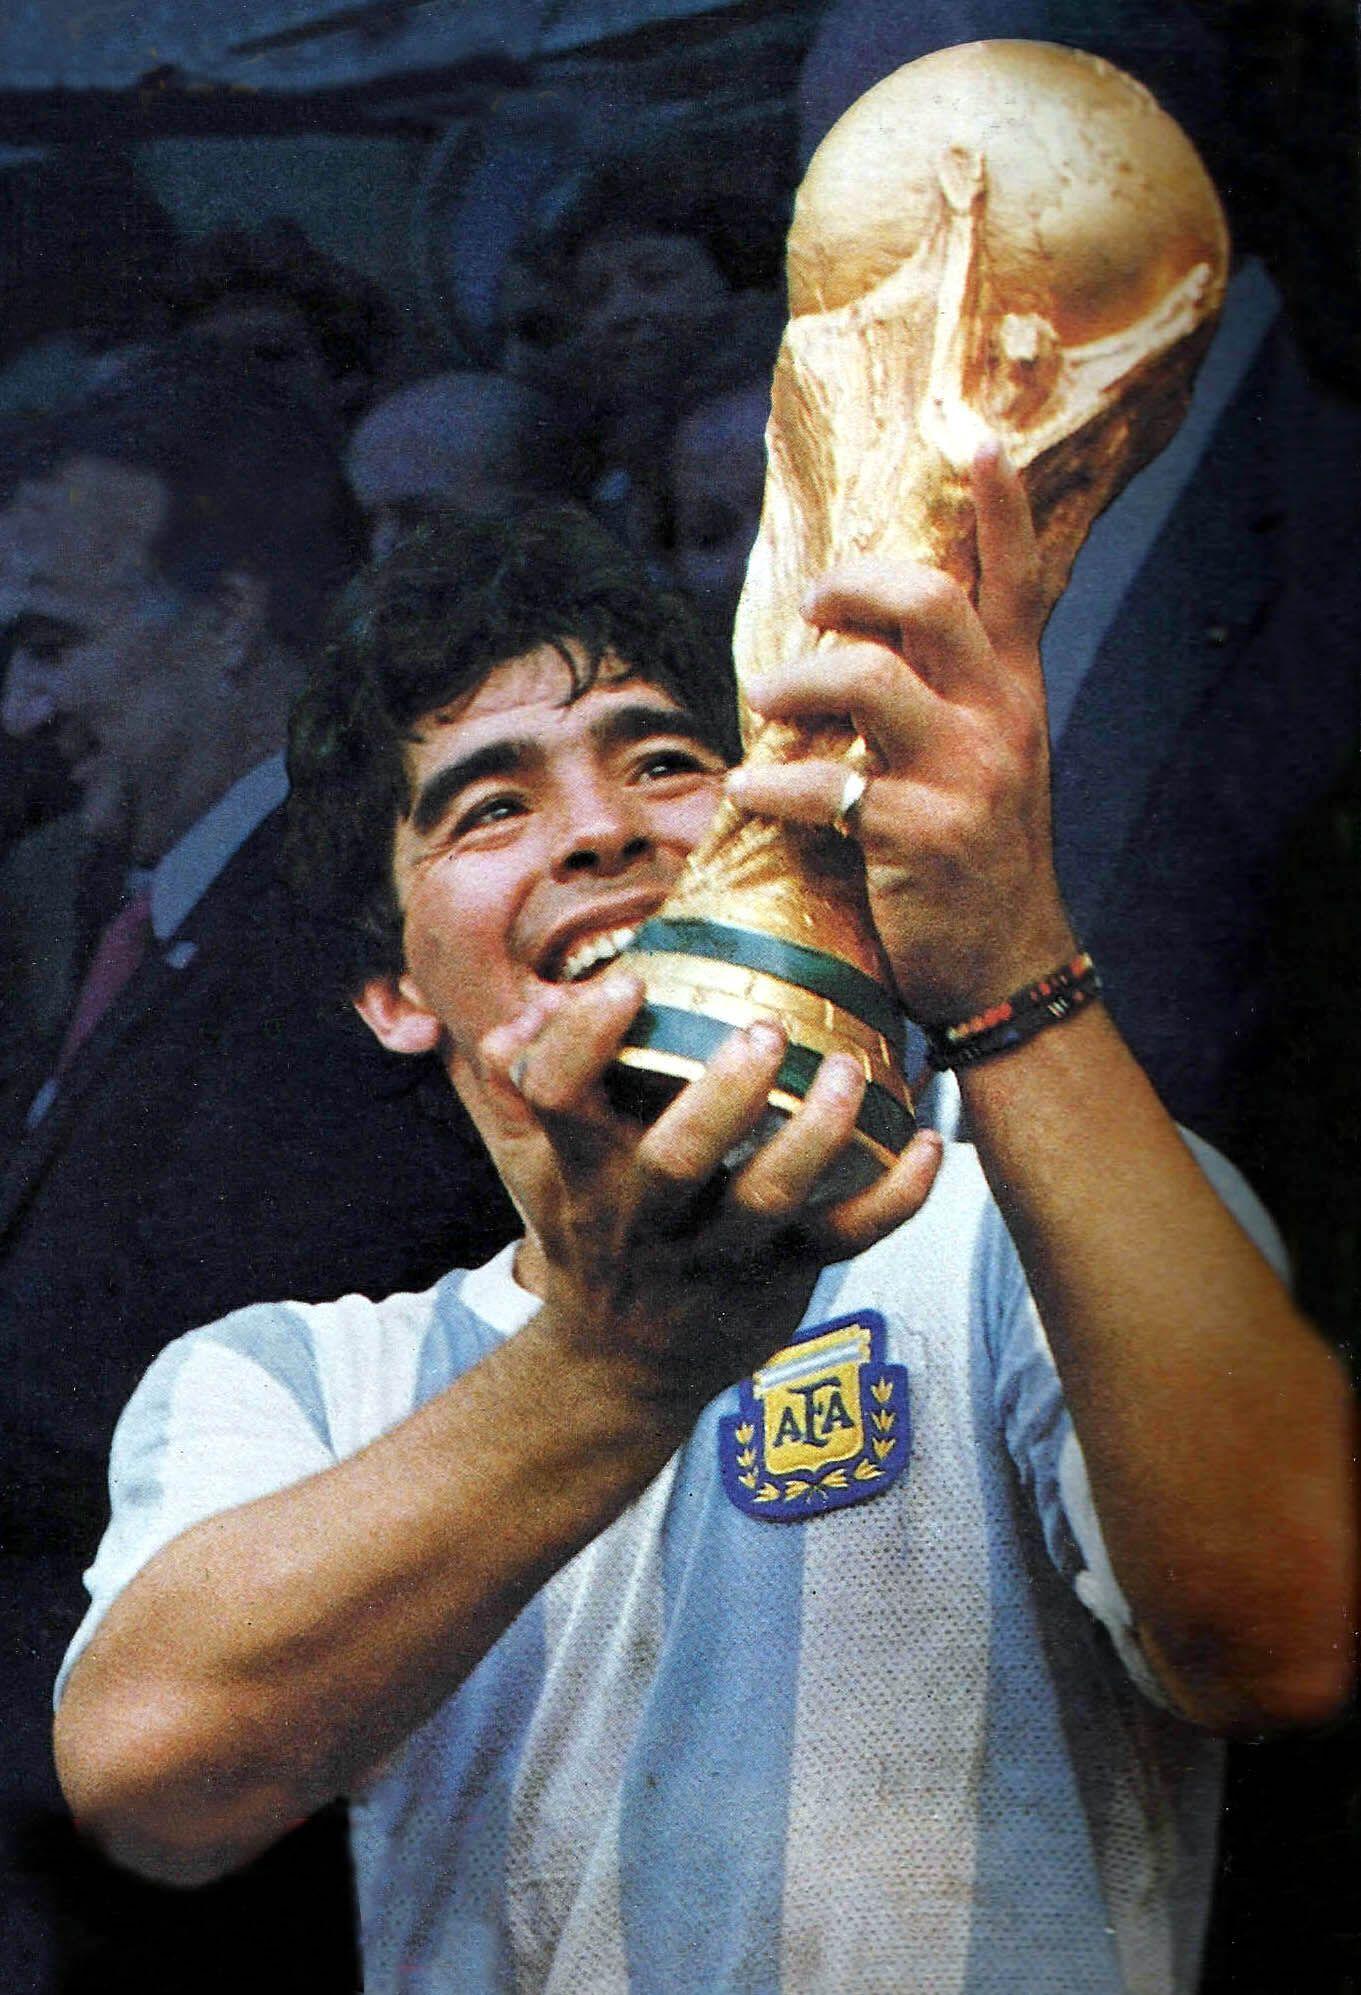 Диего Марадона и трофей чемпионата мира по футболу, 1986 год